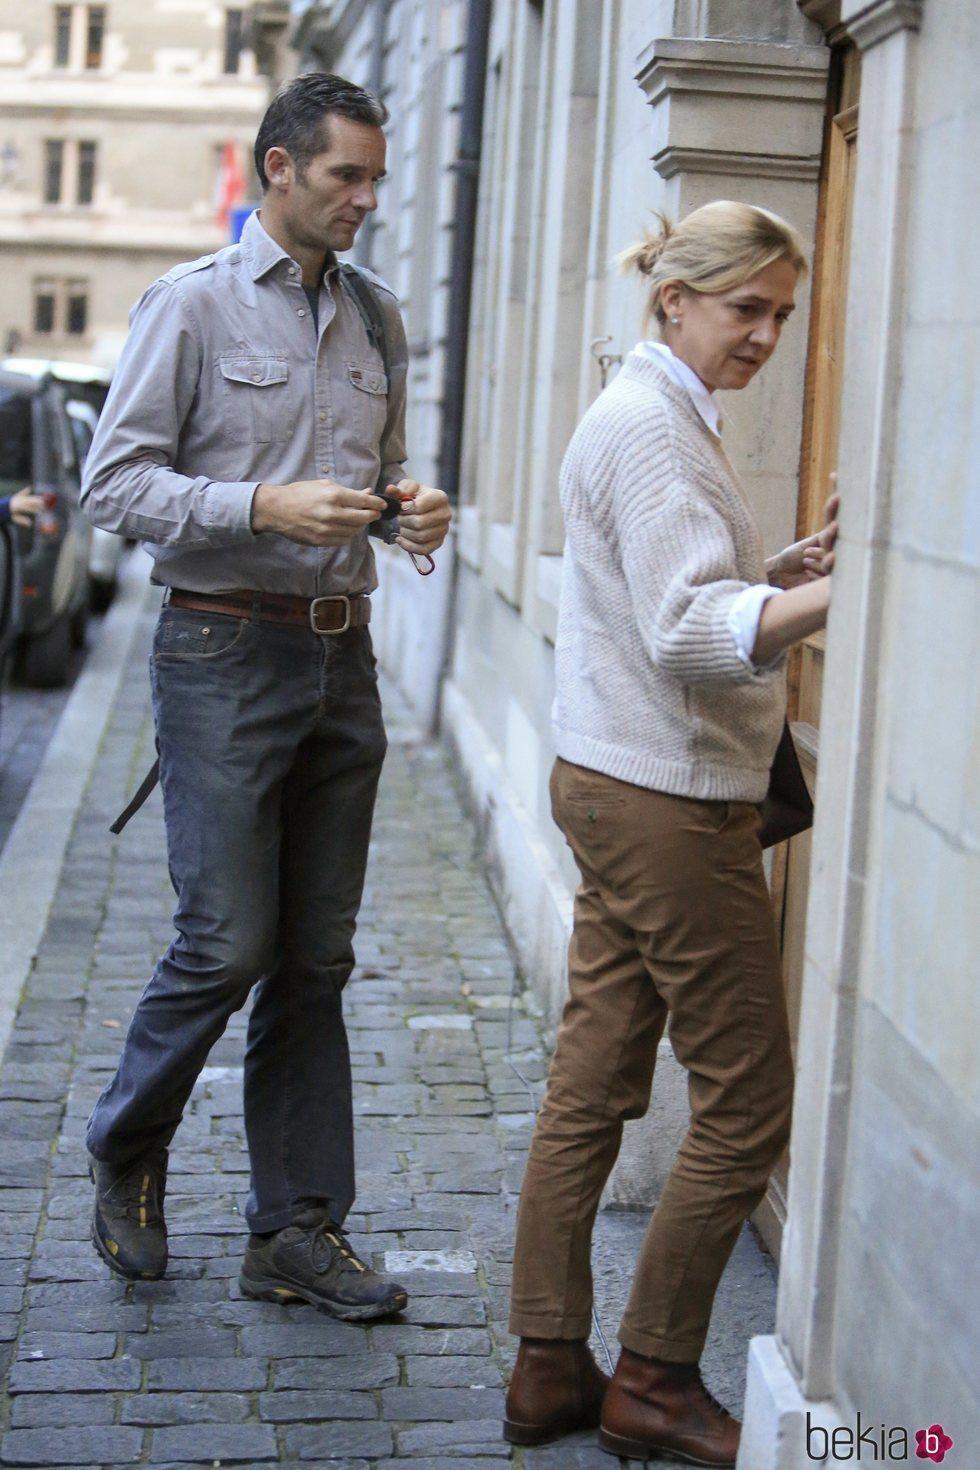 La Infanta Cristina e Iñaki Urdangarin entrando en su casa de Ginebra